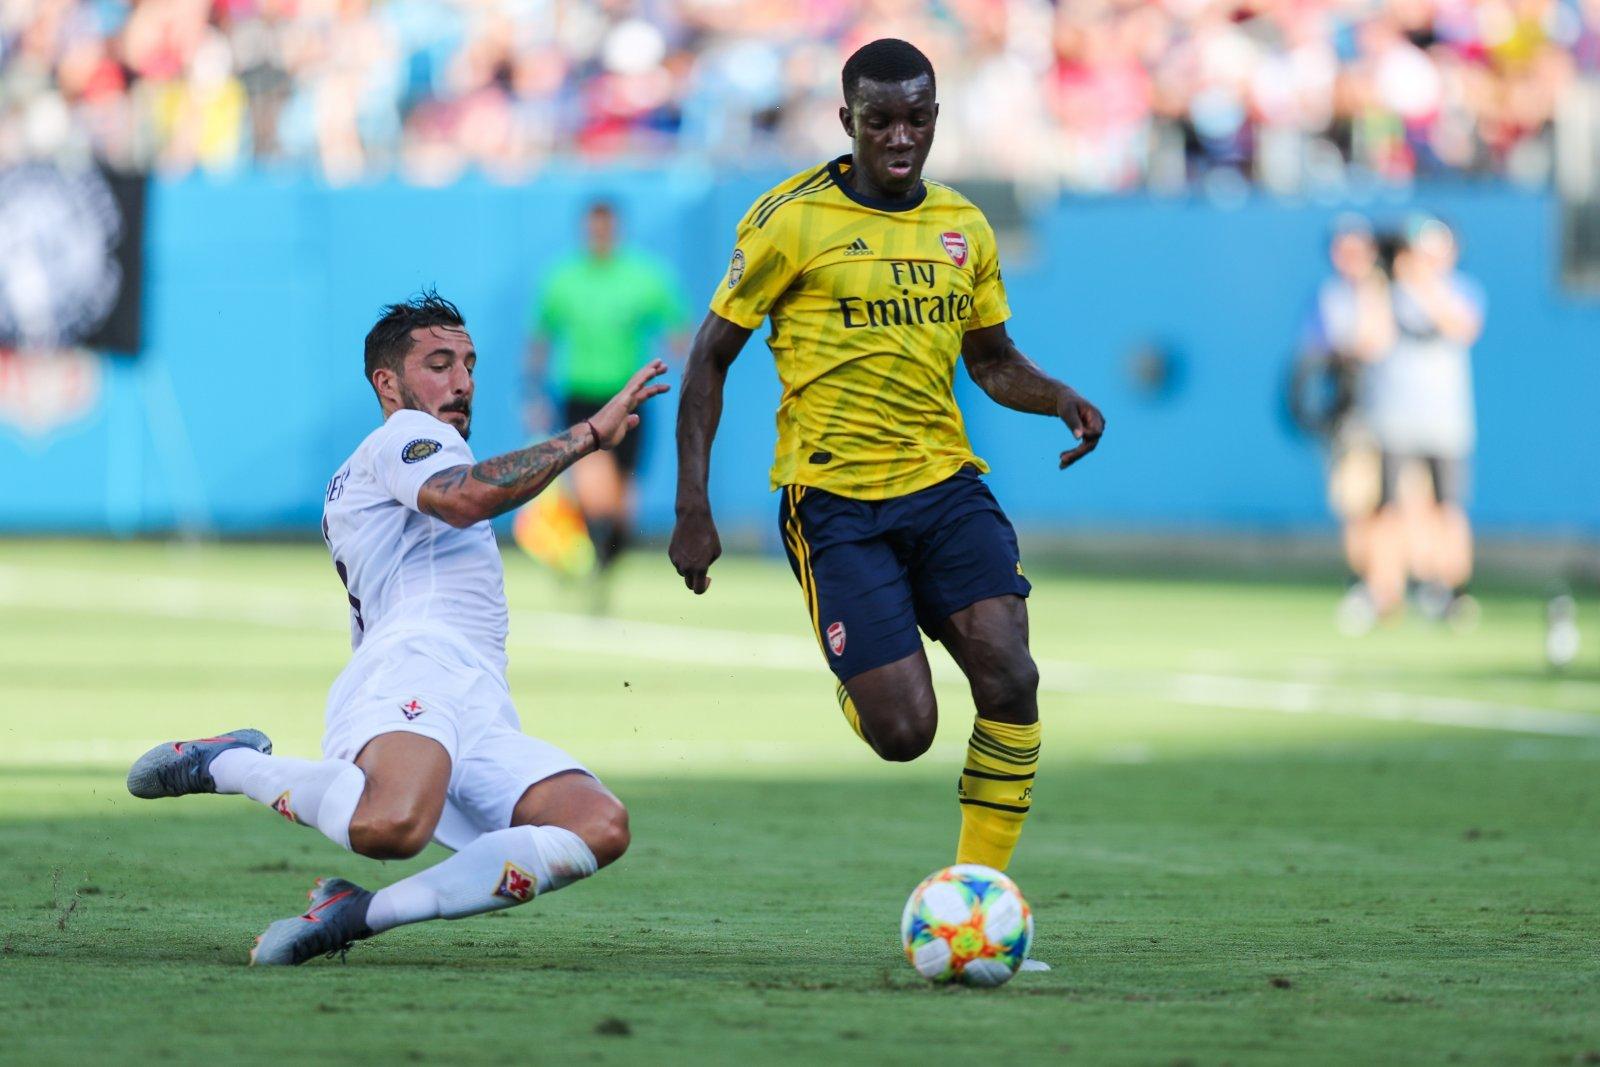 Shoot For The Stars Arsenal Striker Eddie Nketiah Shoot